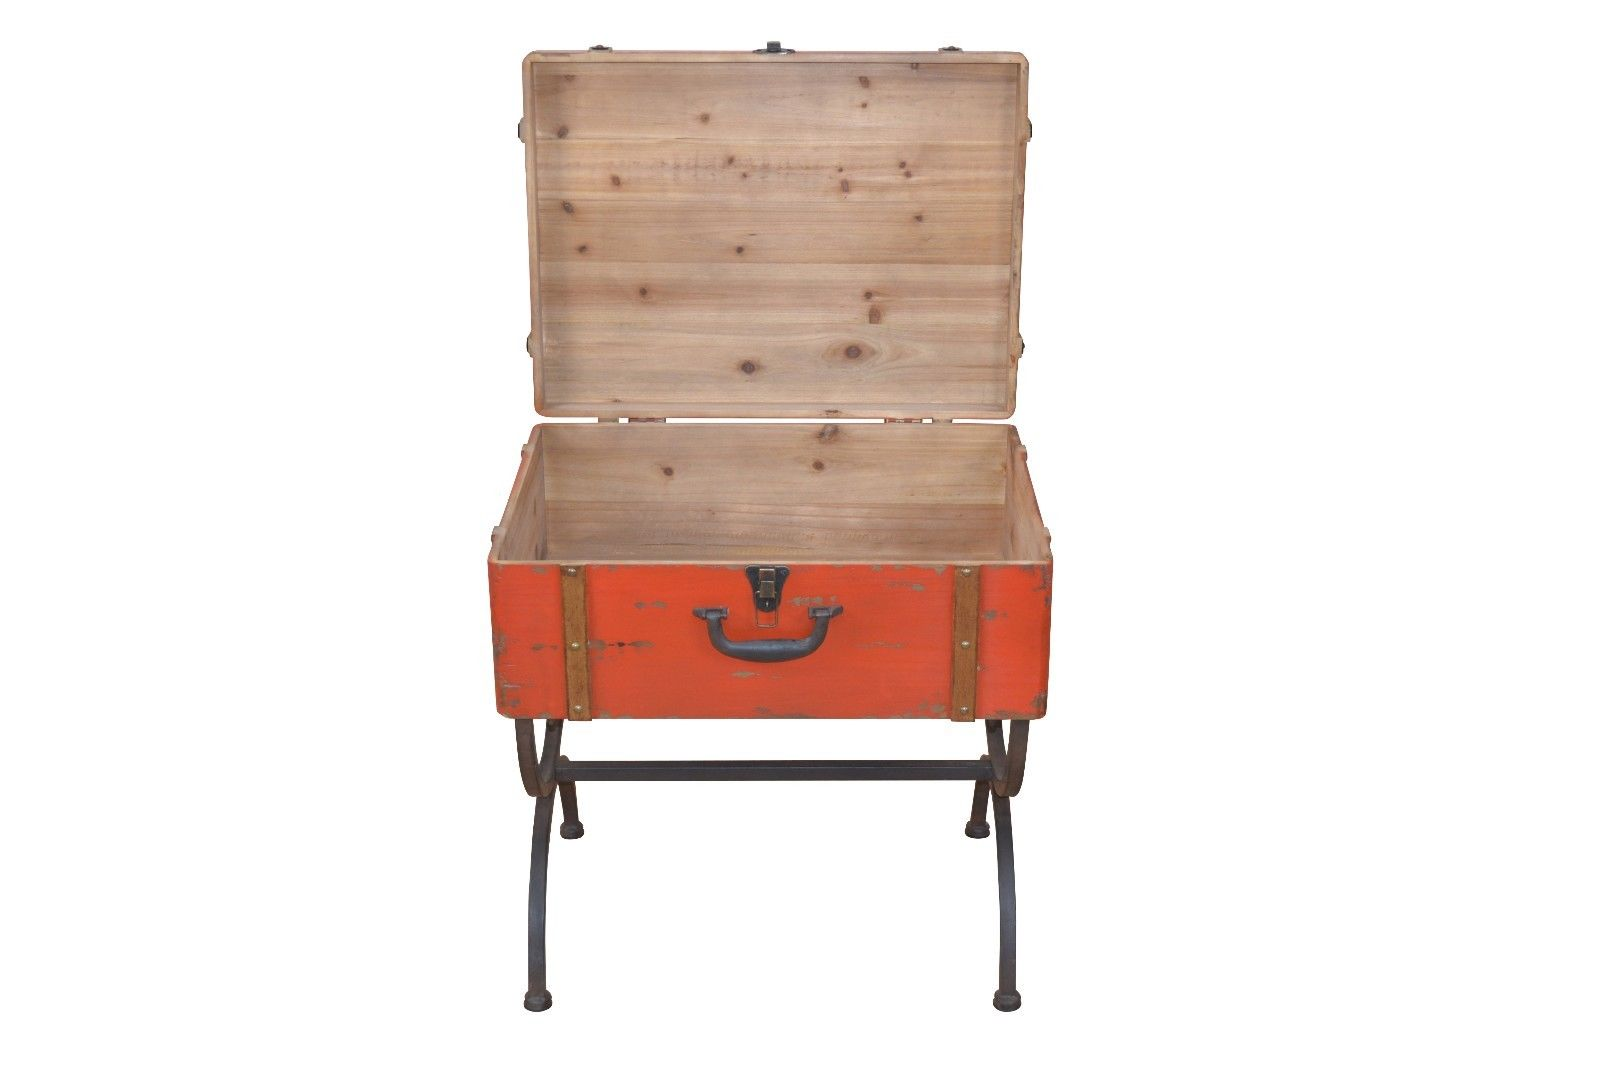 Deko beistelltisch koffer metall holz design truhe kiste for Deko exklusiv